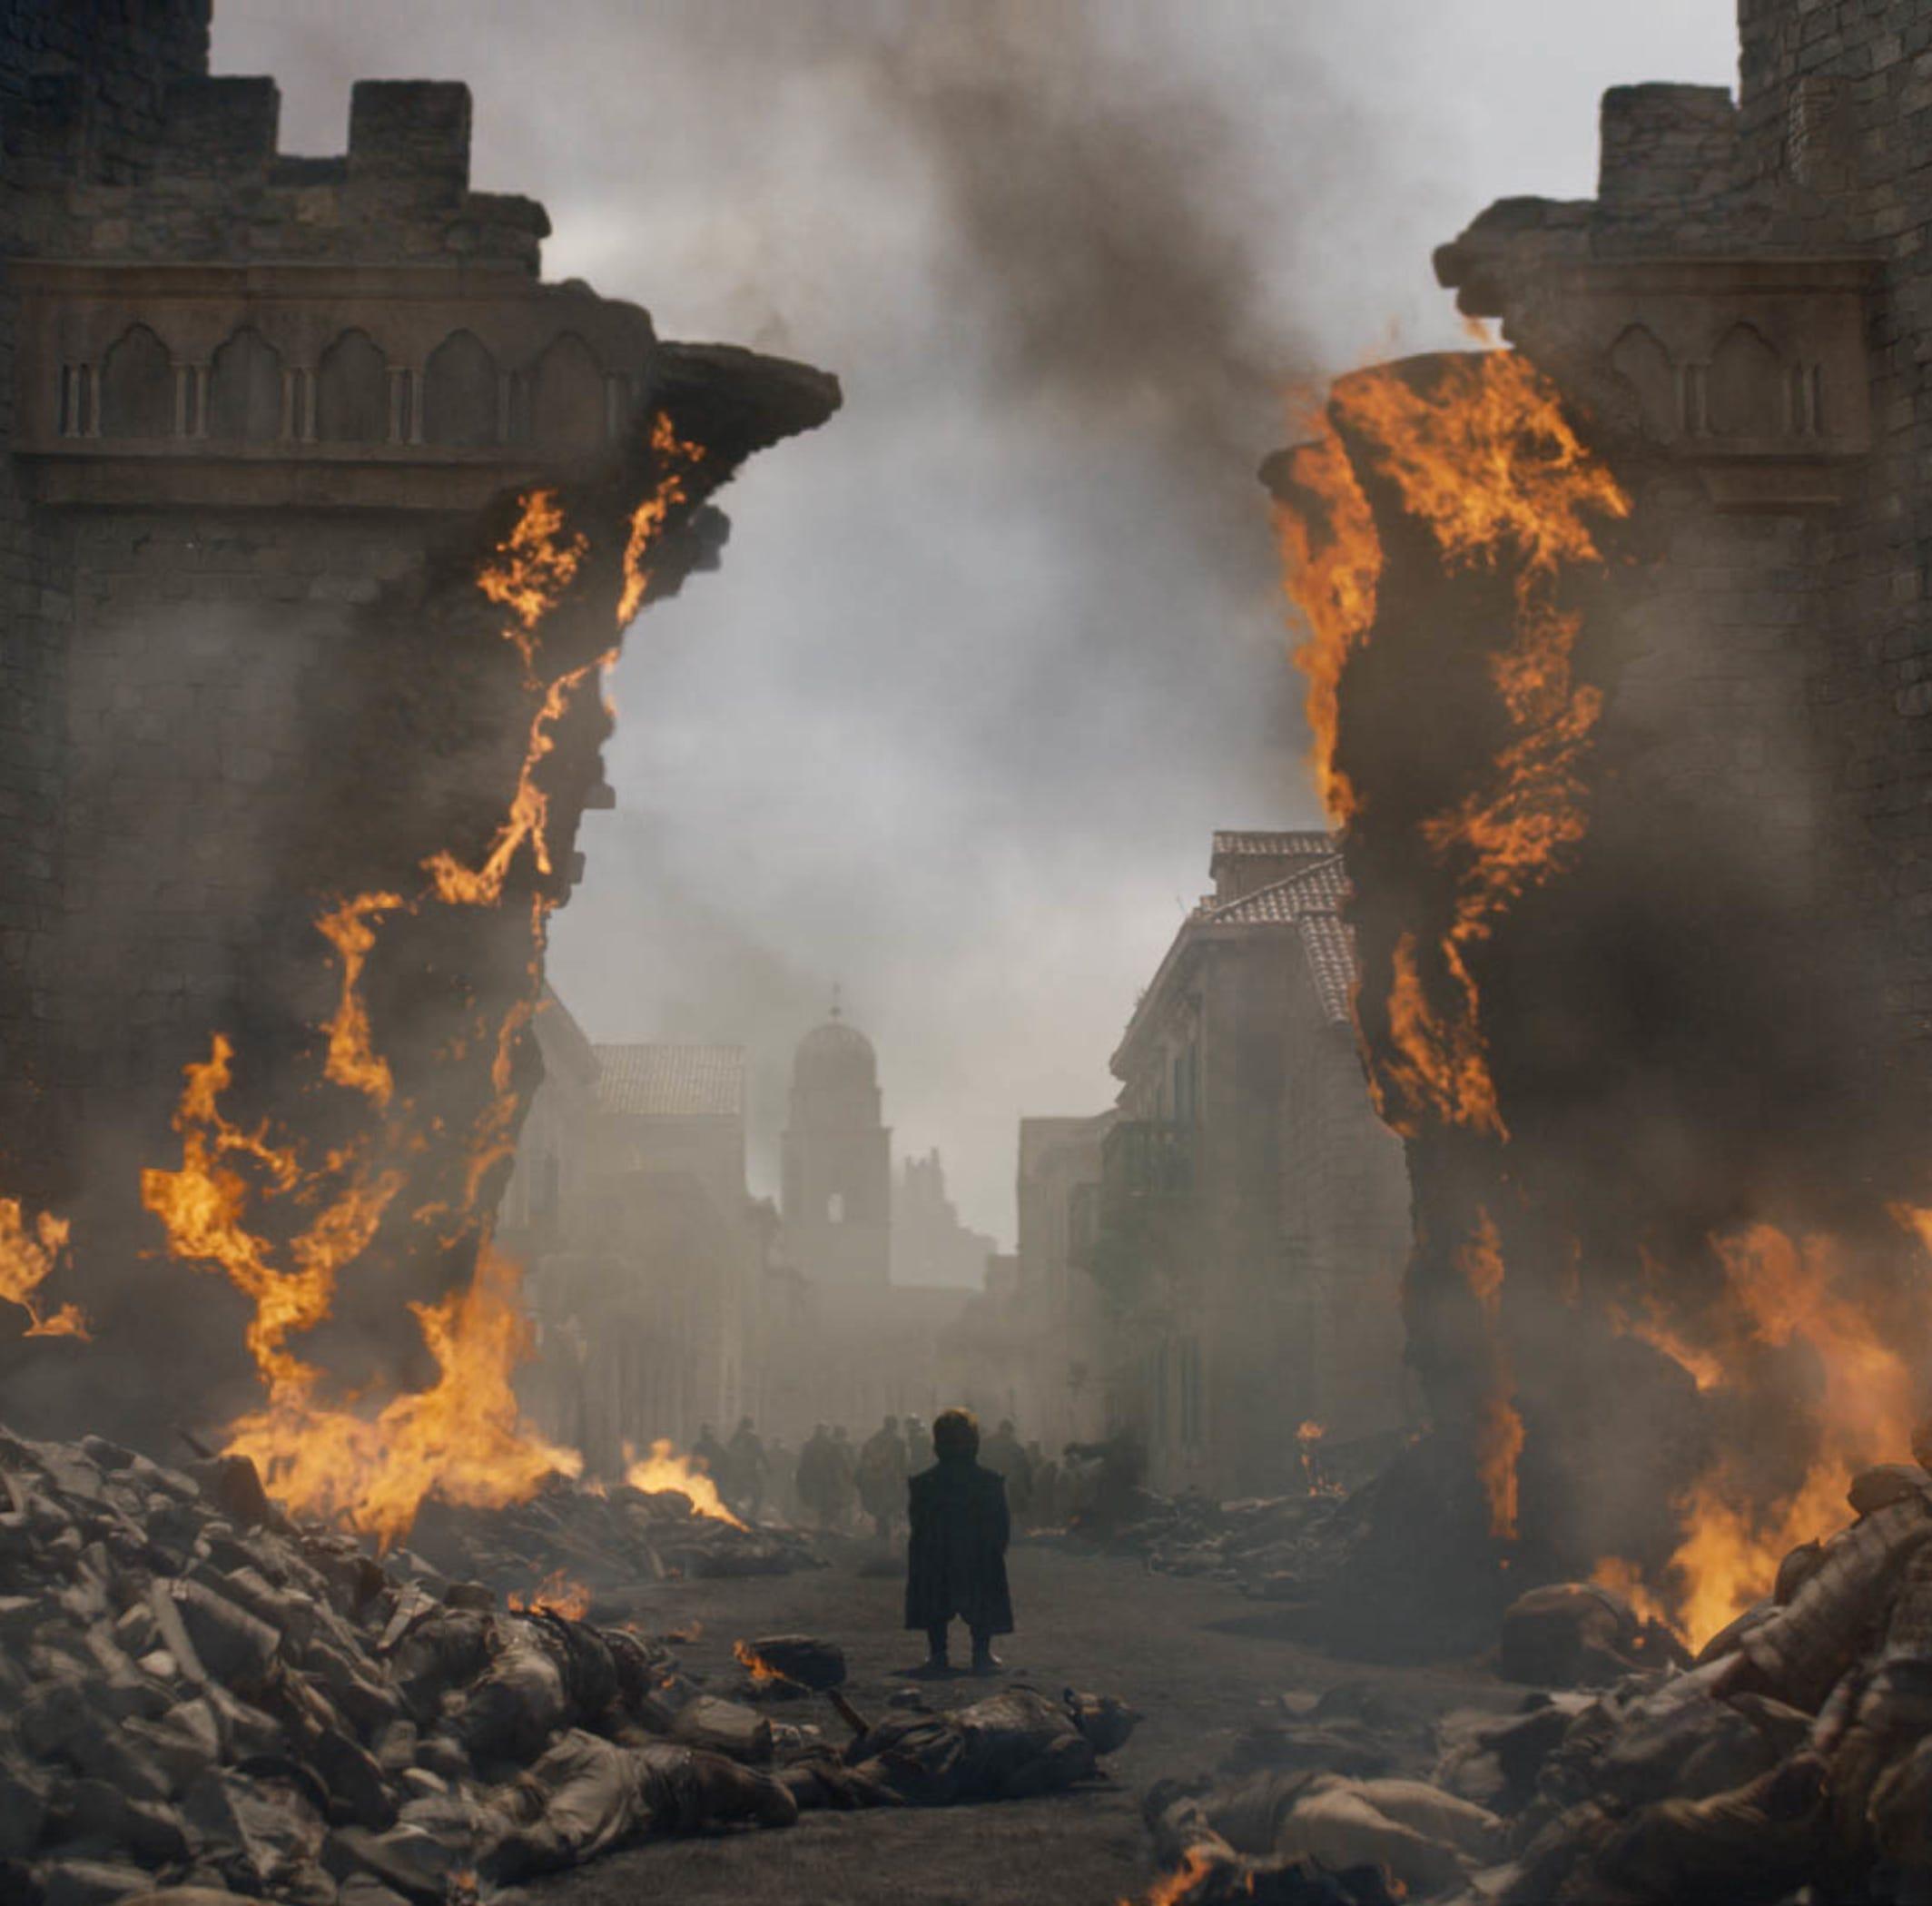 'Game of Thrones' Season 8 'The Bells' recap: Writers' bad habits on display in episode